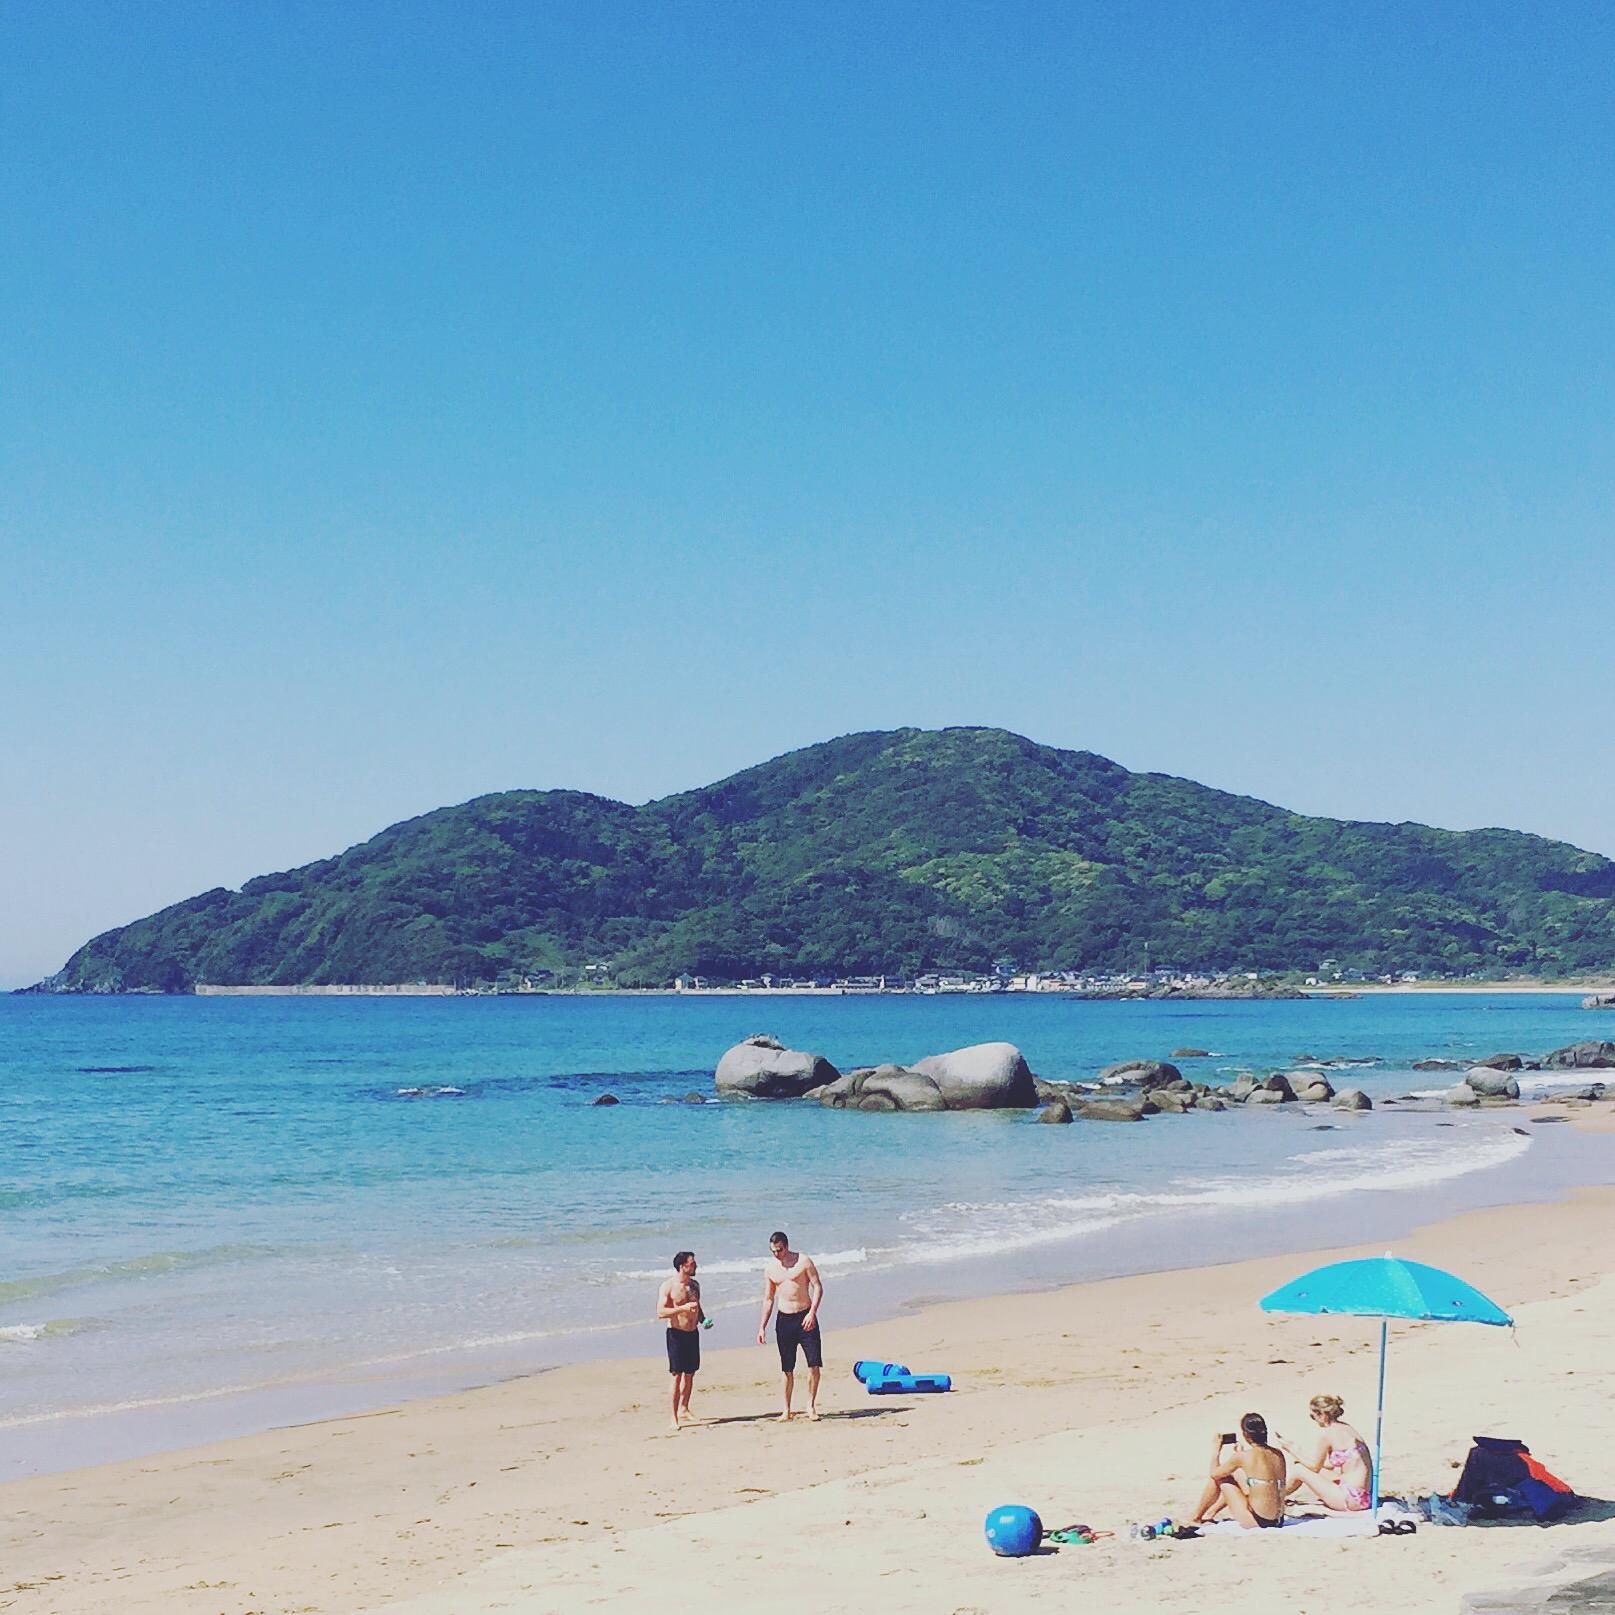 糸島・幣の浜_d0116009_1442497.jpg